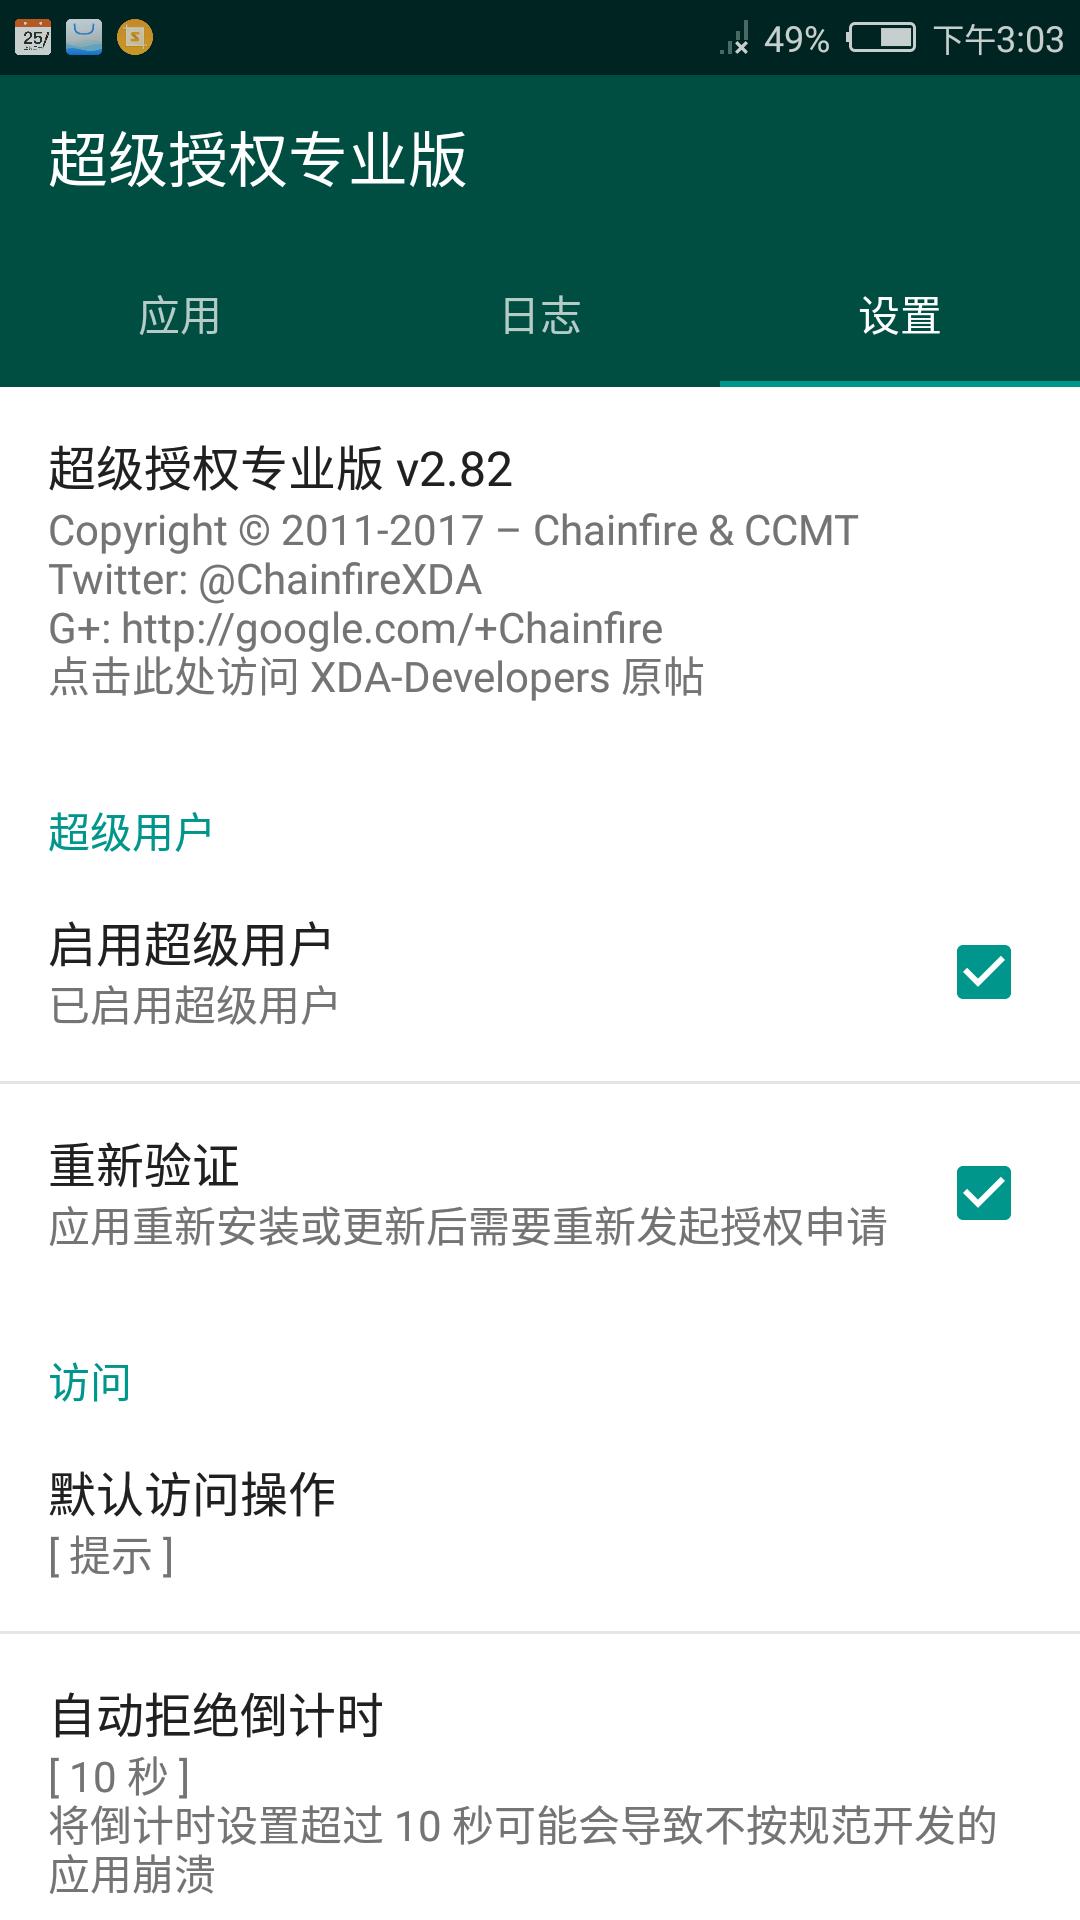 Screenshot_2012-10-31-15-03-58.png